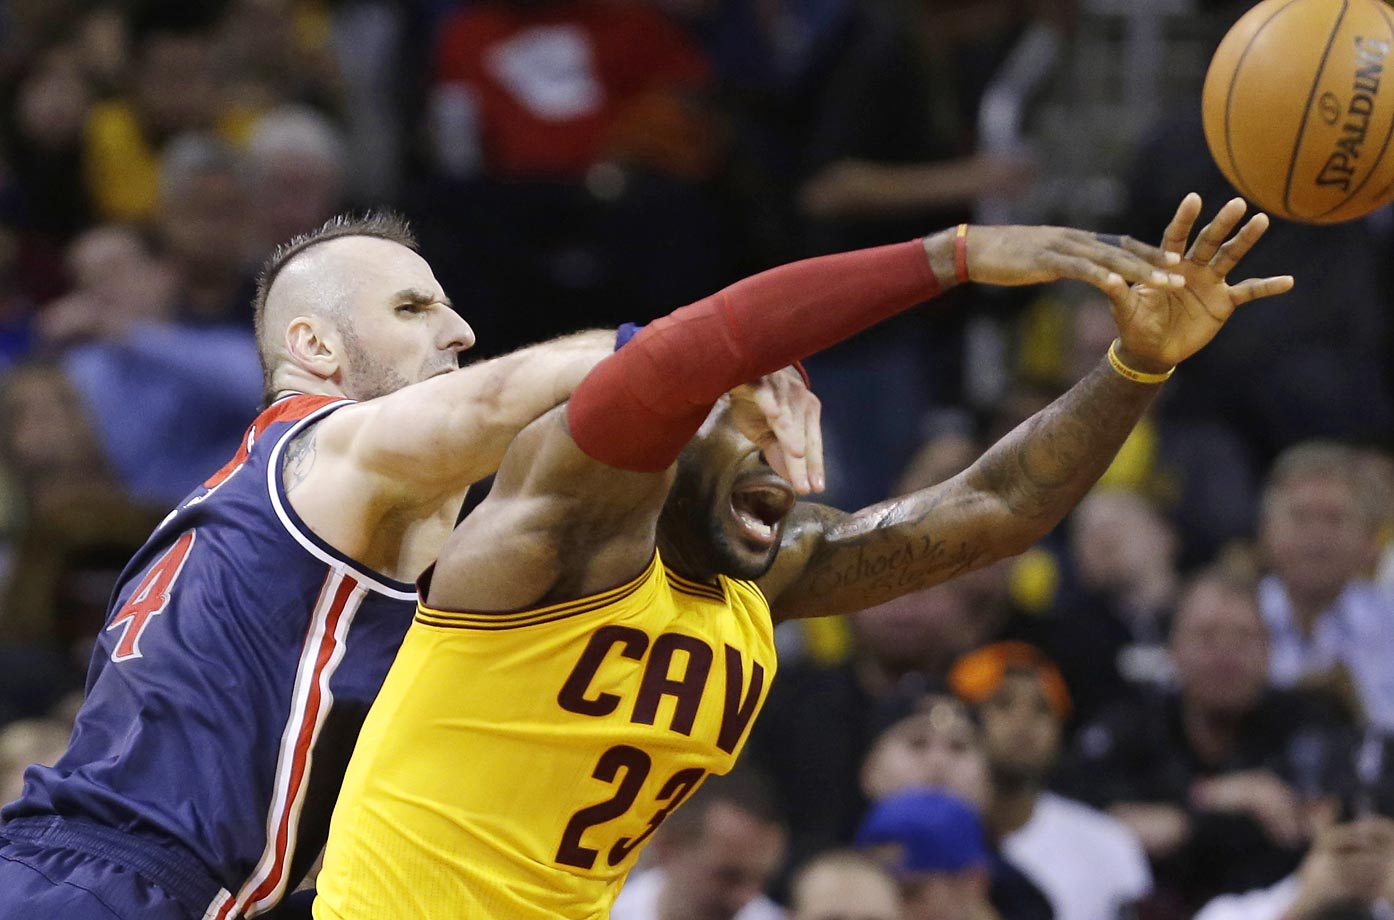 The Washington Wizards' Marcin Gortat fouls LeBron James during the Cavs' 113-87 win.